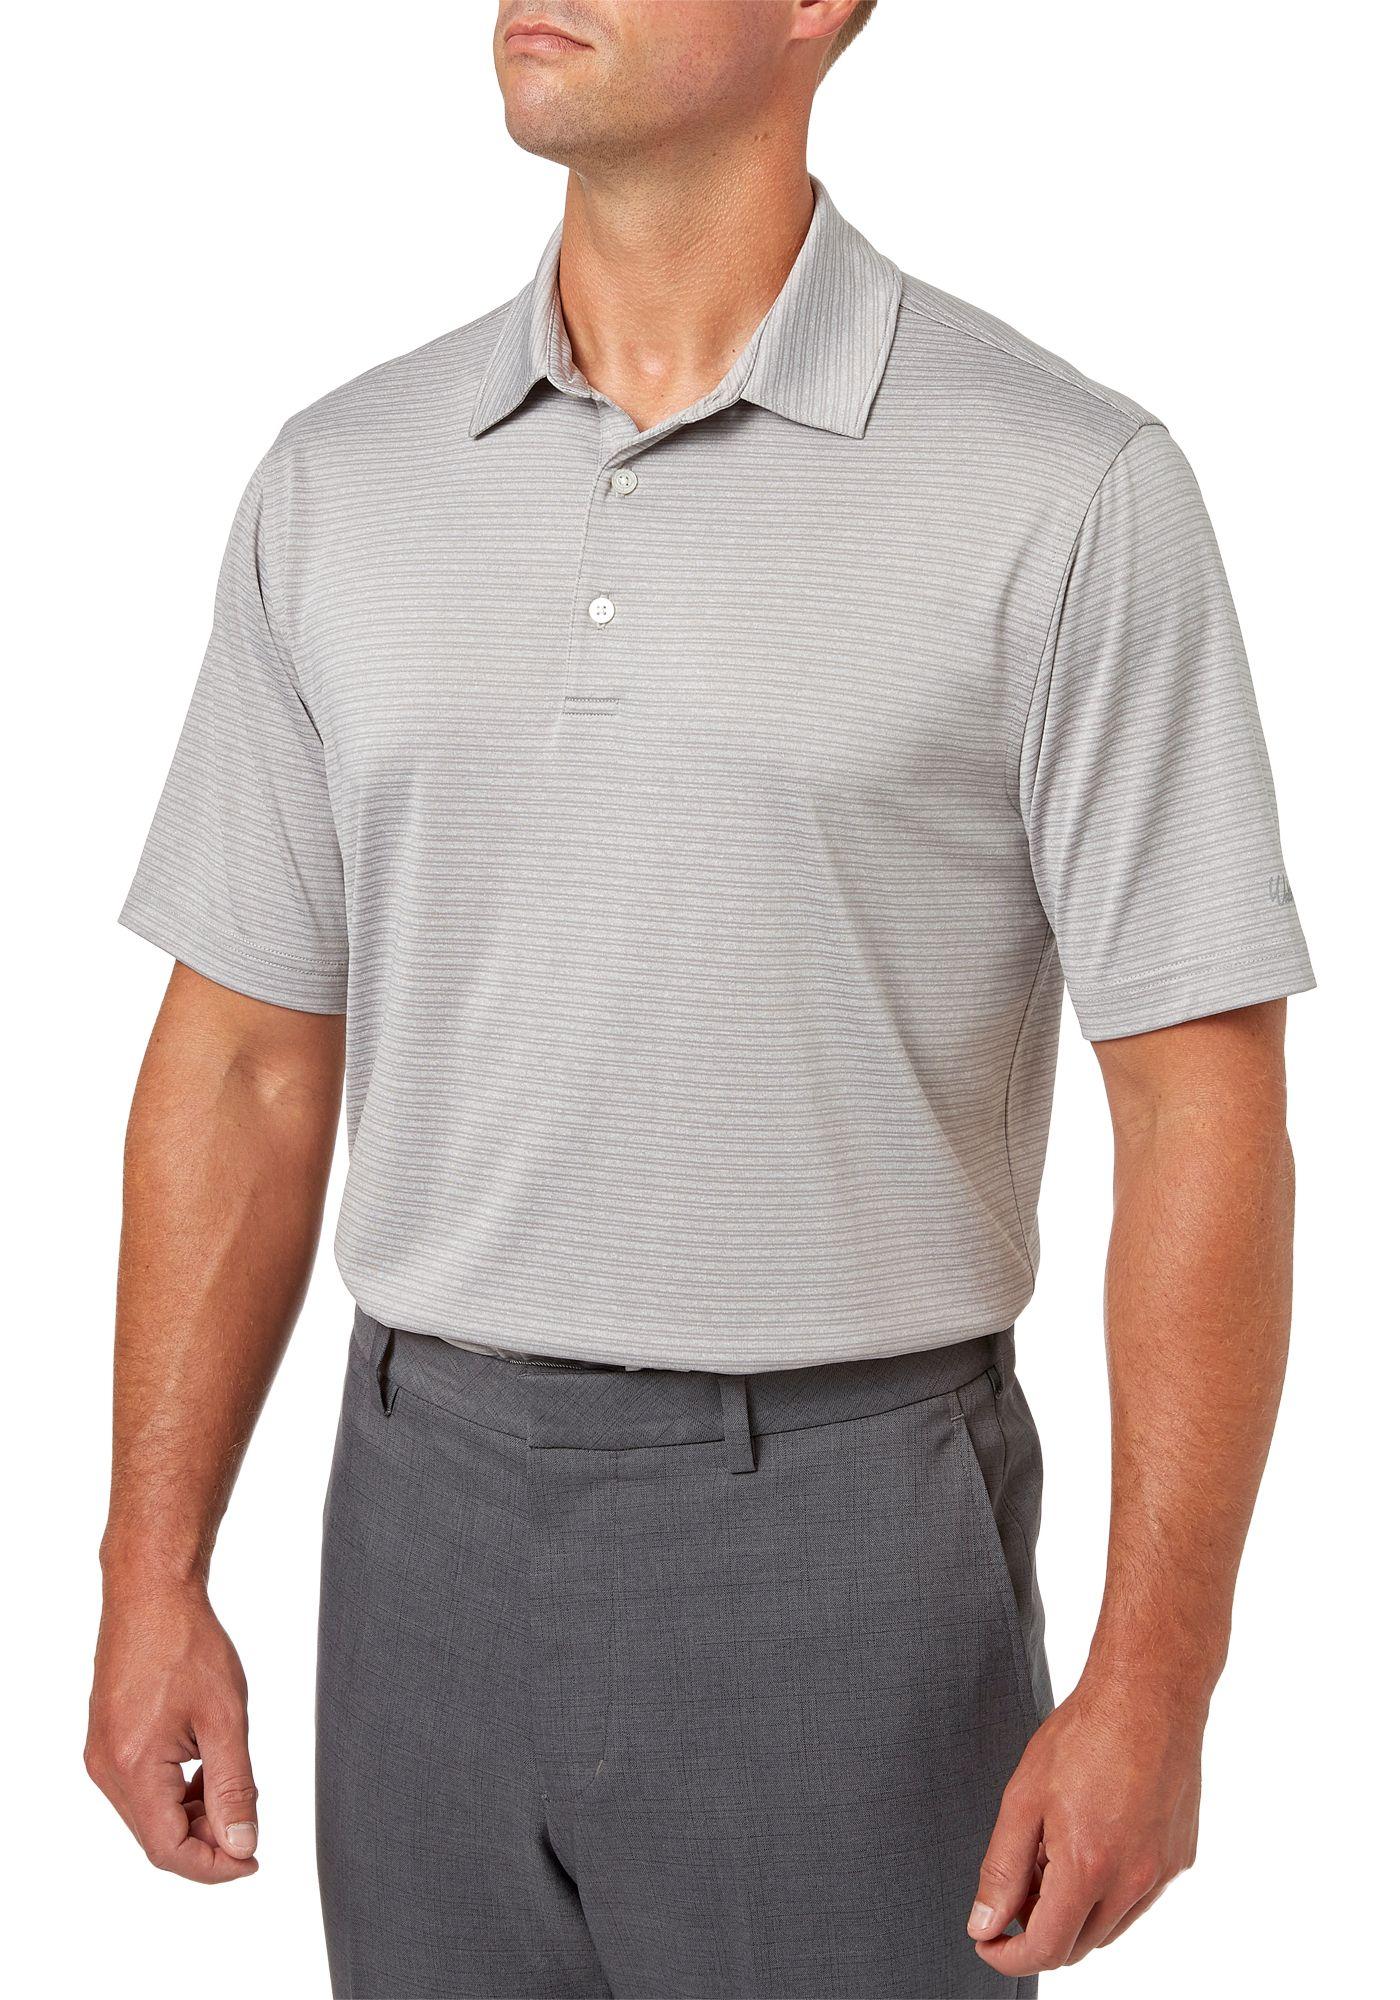 Walter Hagen Stripe Polo - Extended Sizes